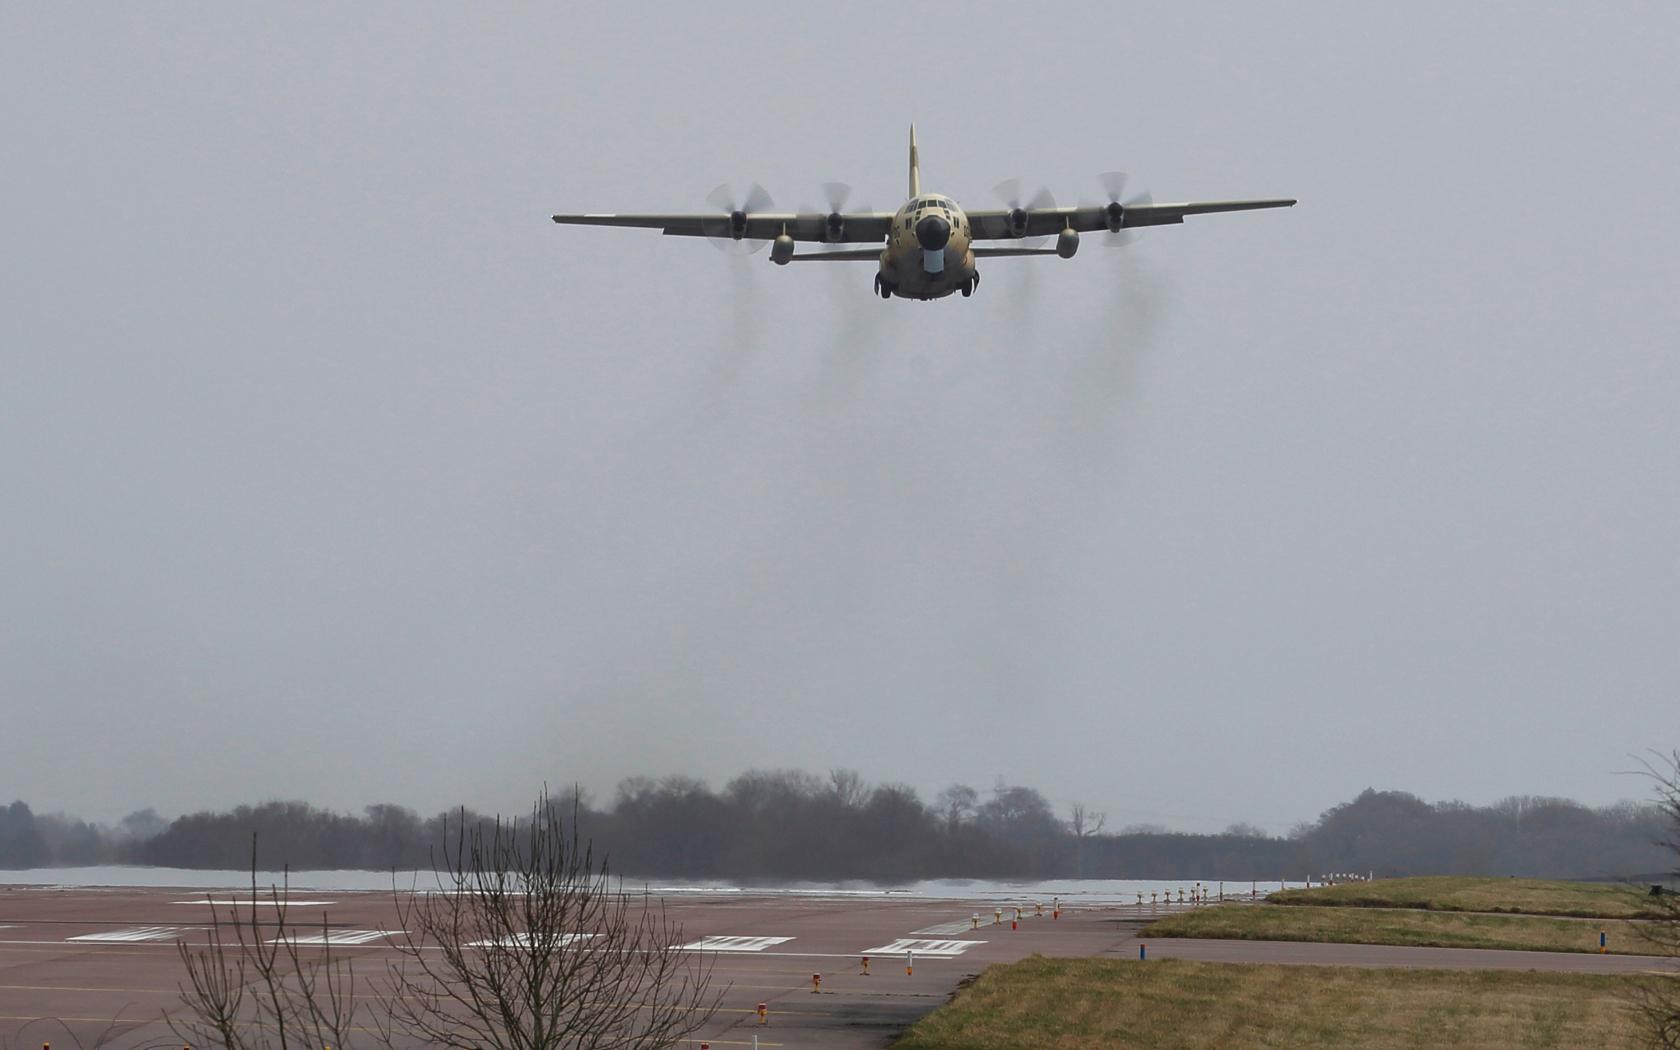 FRA: Photos d'avions de transport - Page 21 16682487211_8b3f9c0615_o